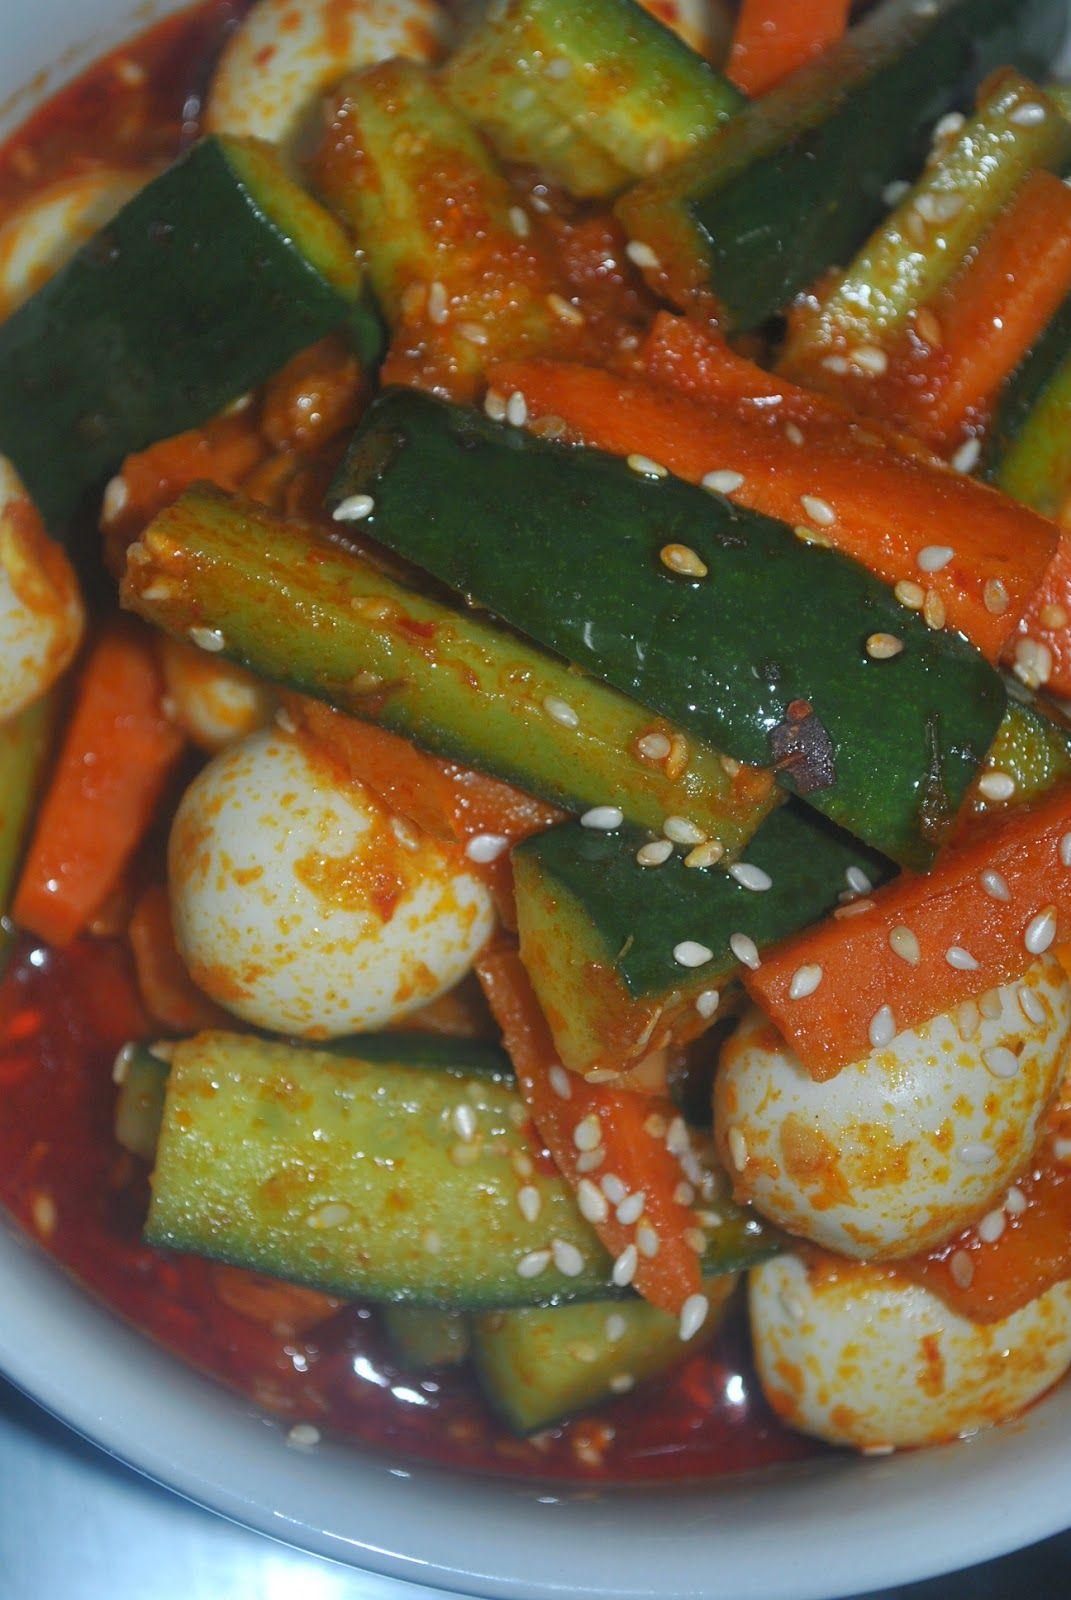 Patyskitchen Acar Rampai Telur Puyuh Recipes Food Cucumber